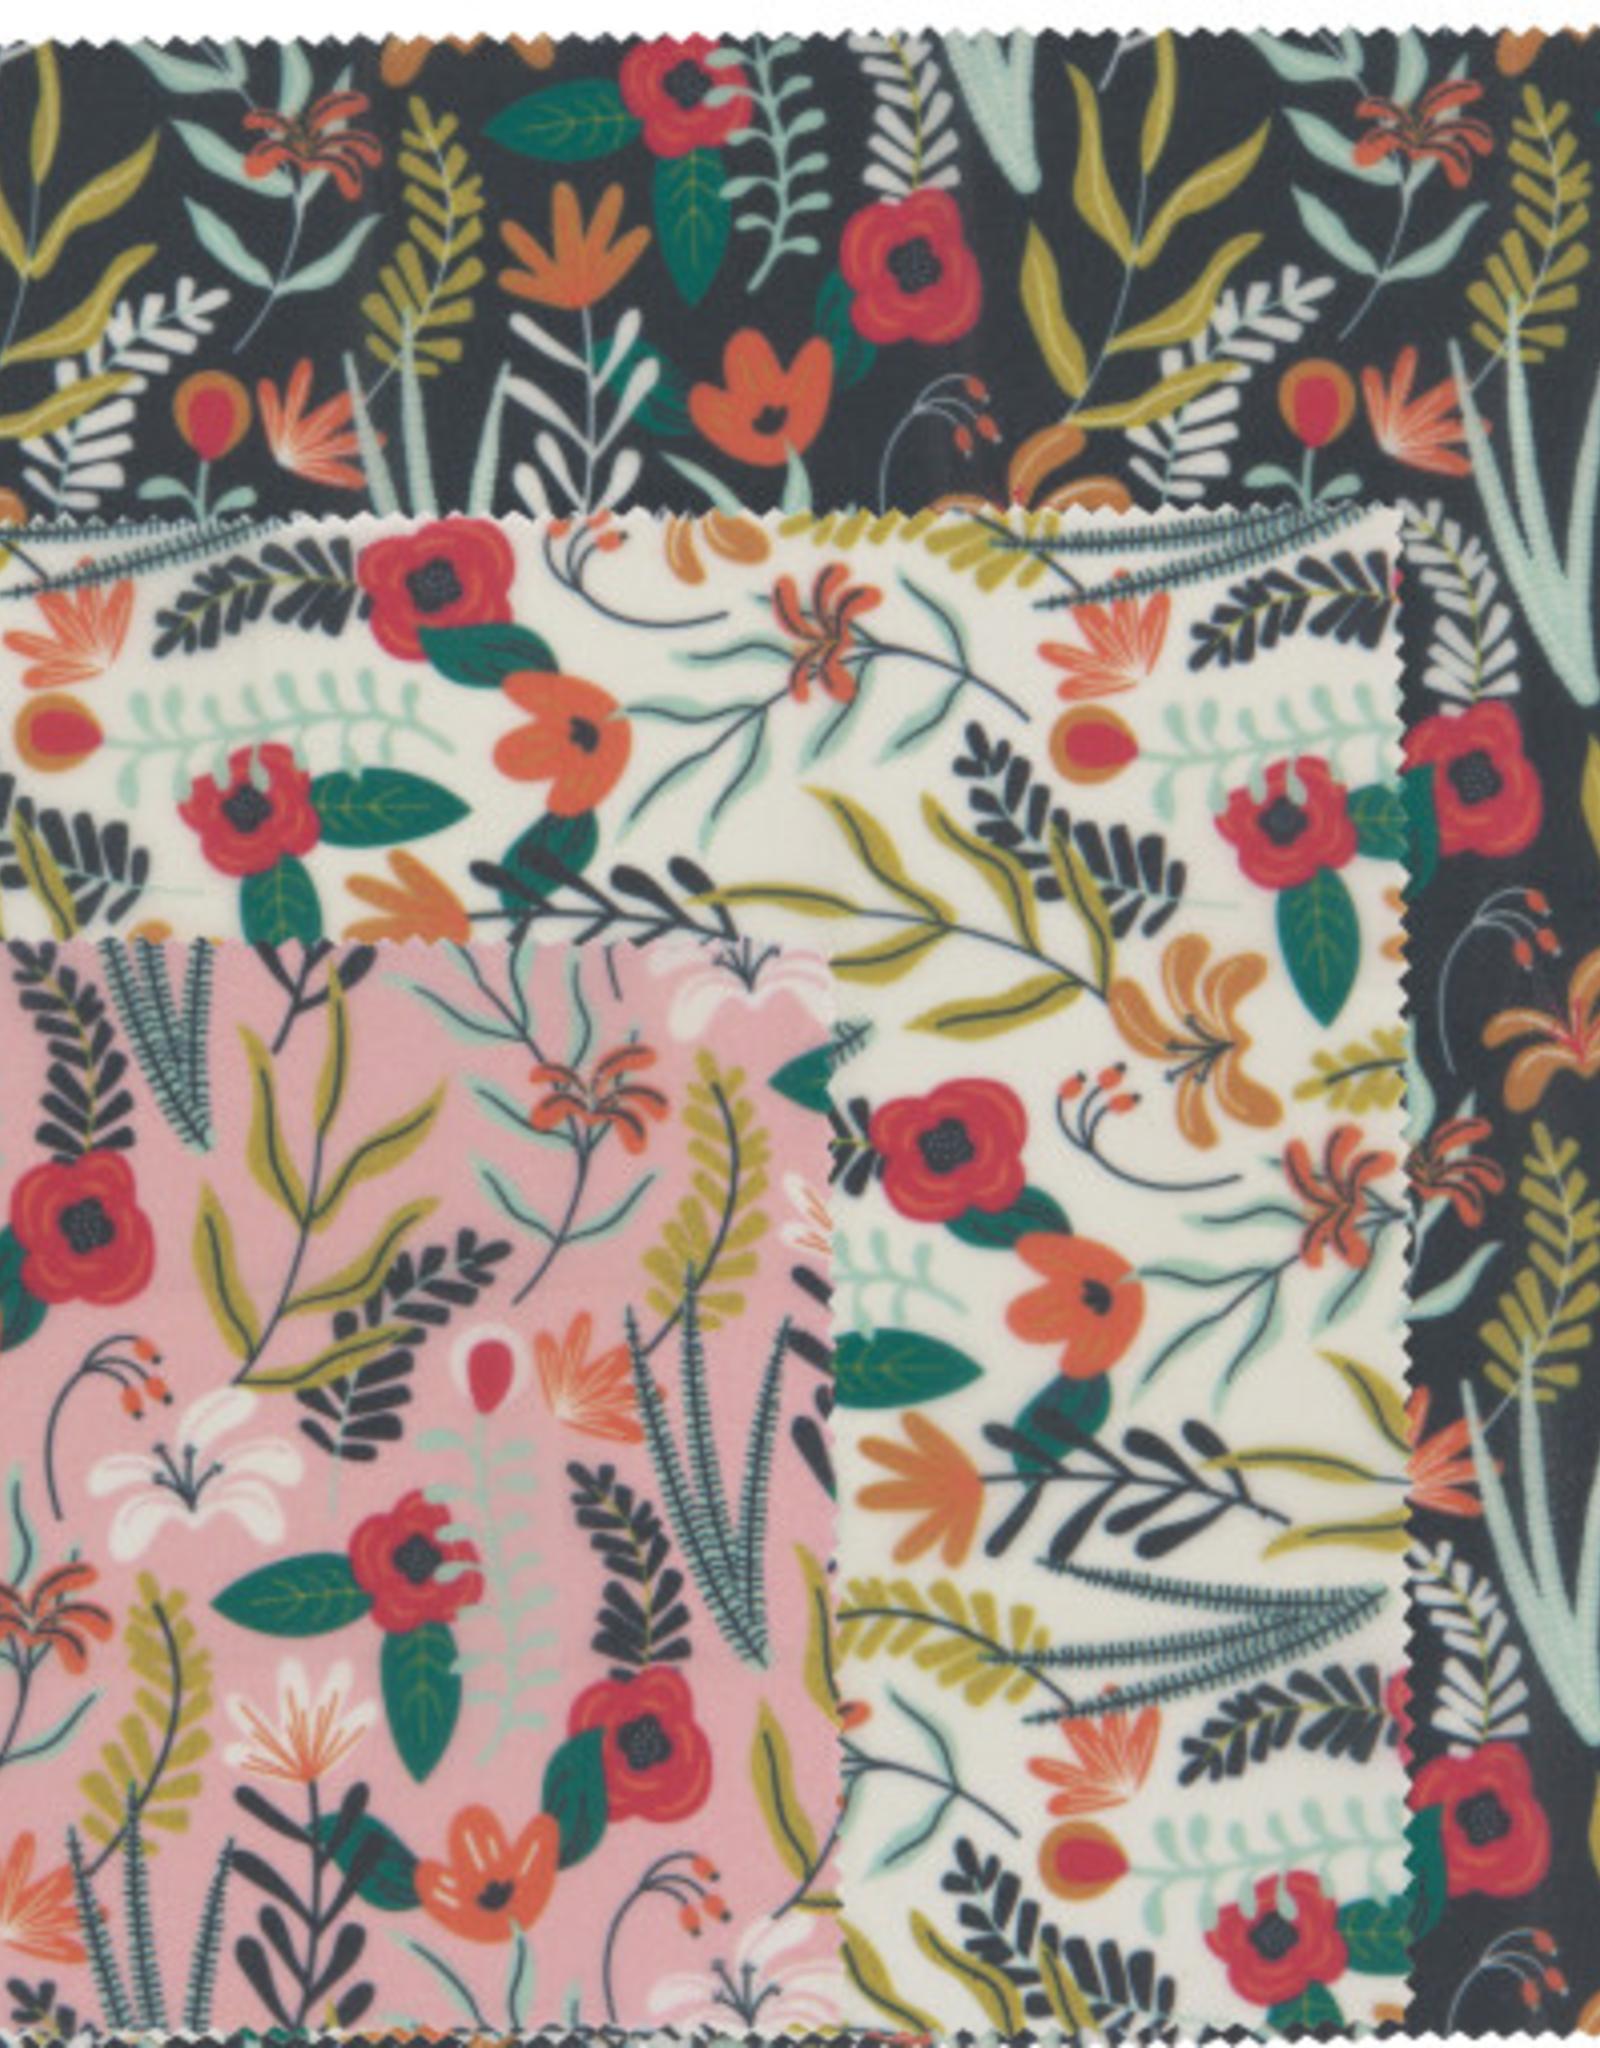 Danica Danica Beeswax Wrap-Floral Set 3